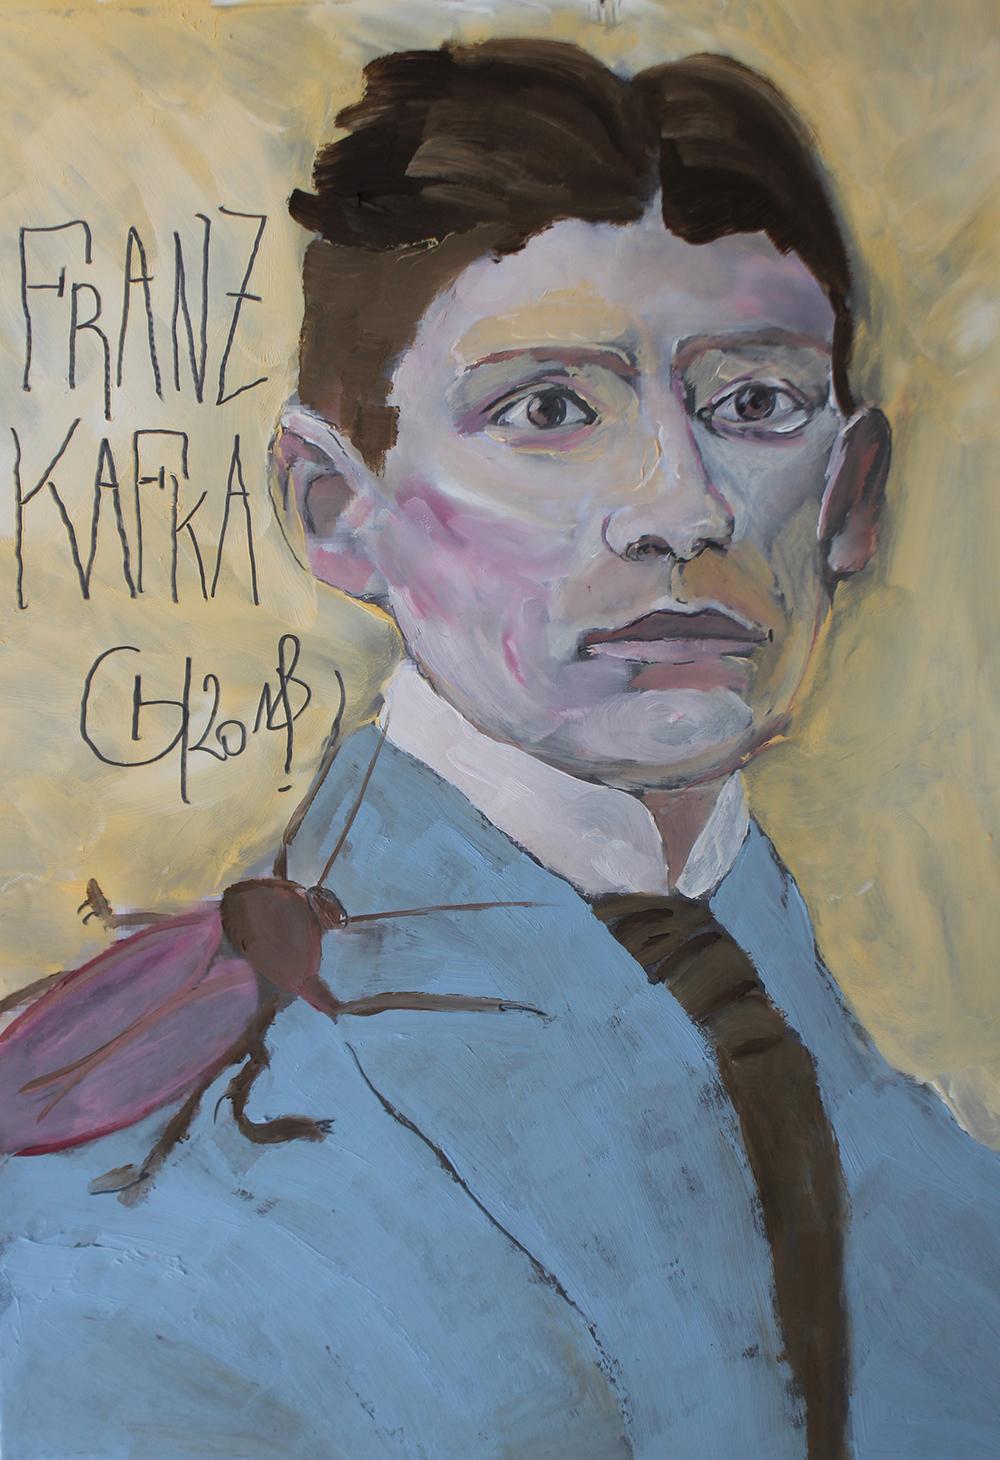 6. Franz Kafka - Grégory Huck